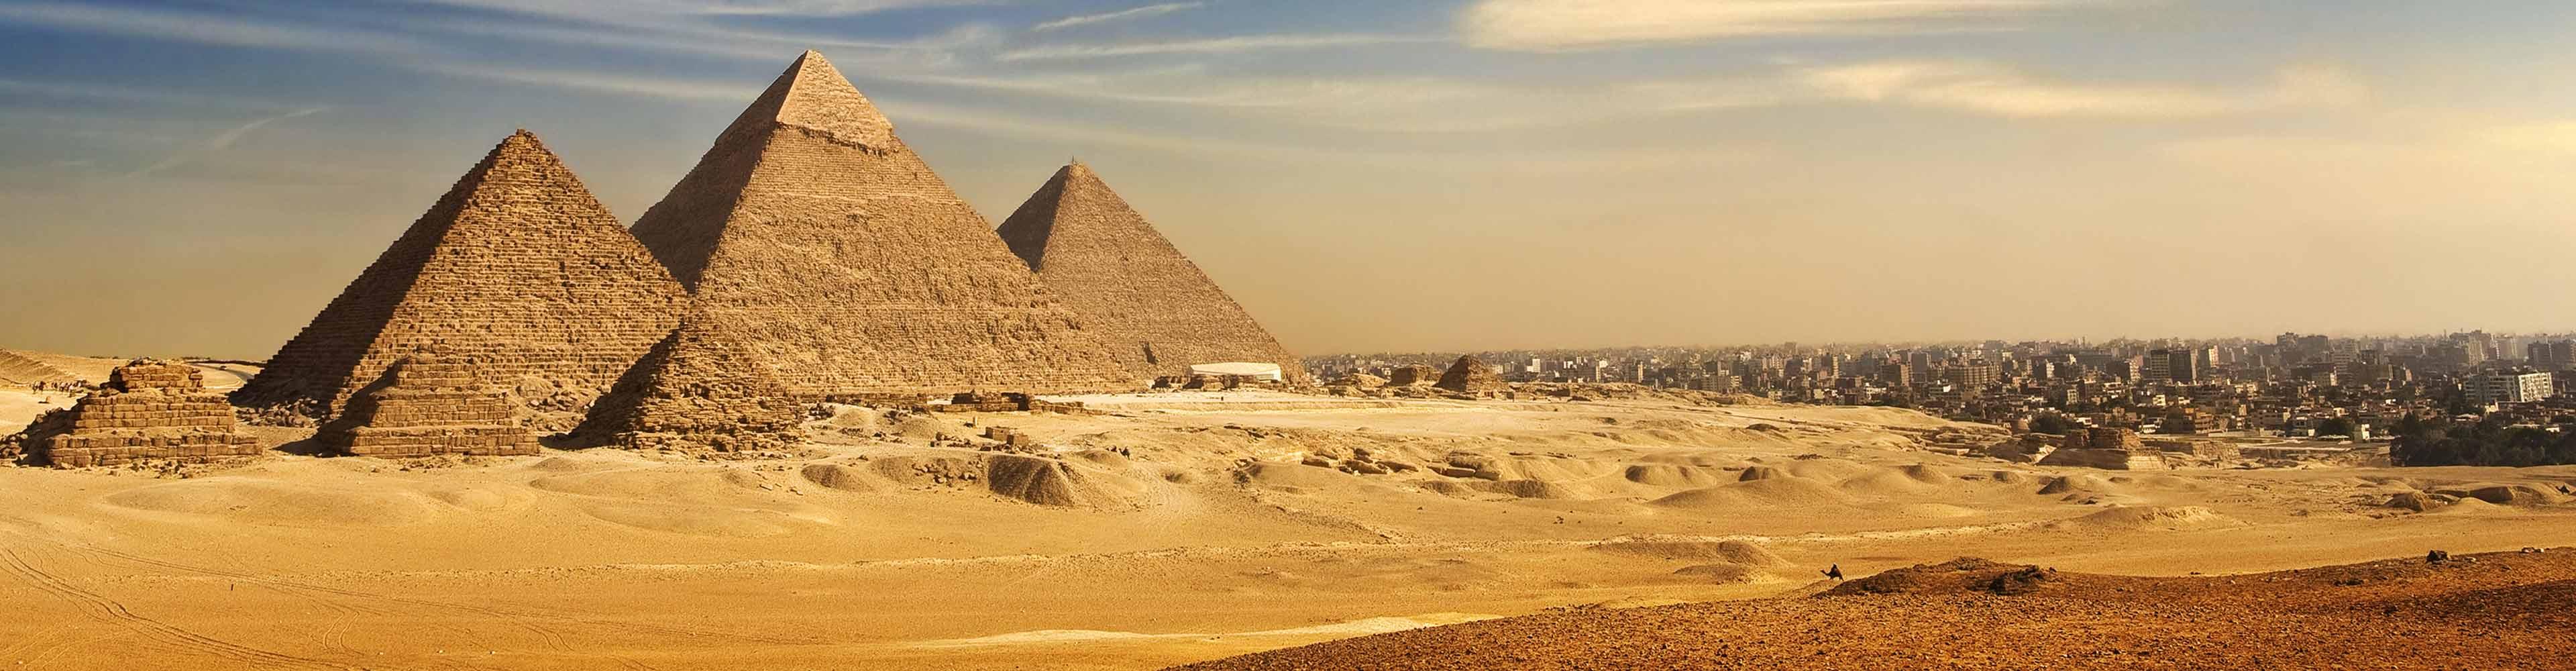 Pyramids, Mummies & Pharaohs – Limited Edition